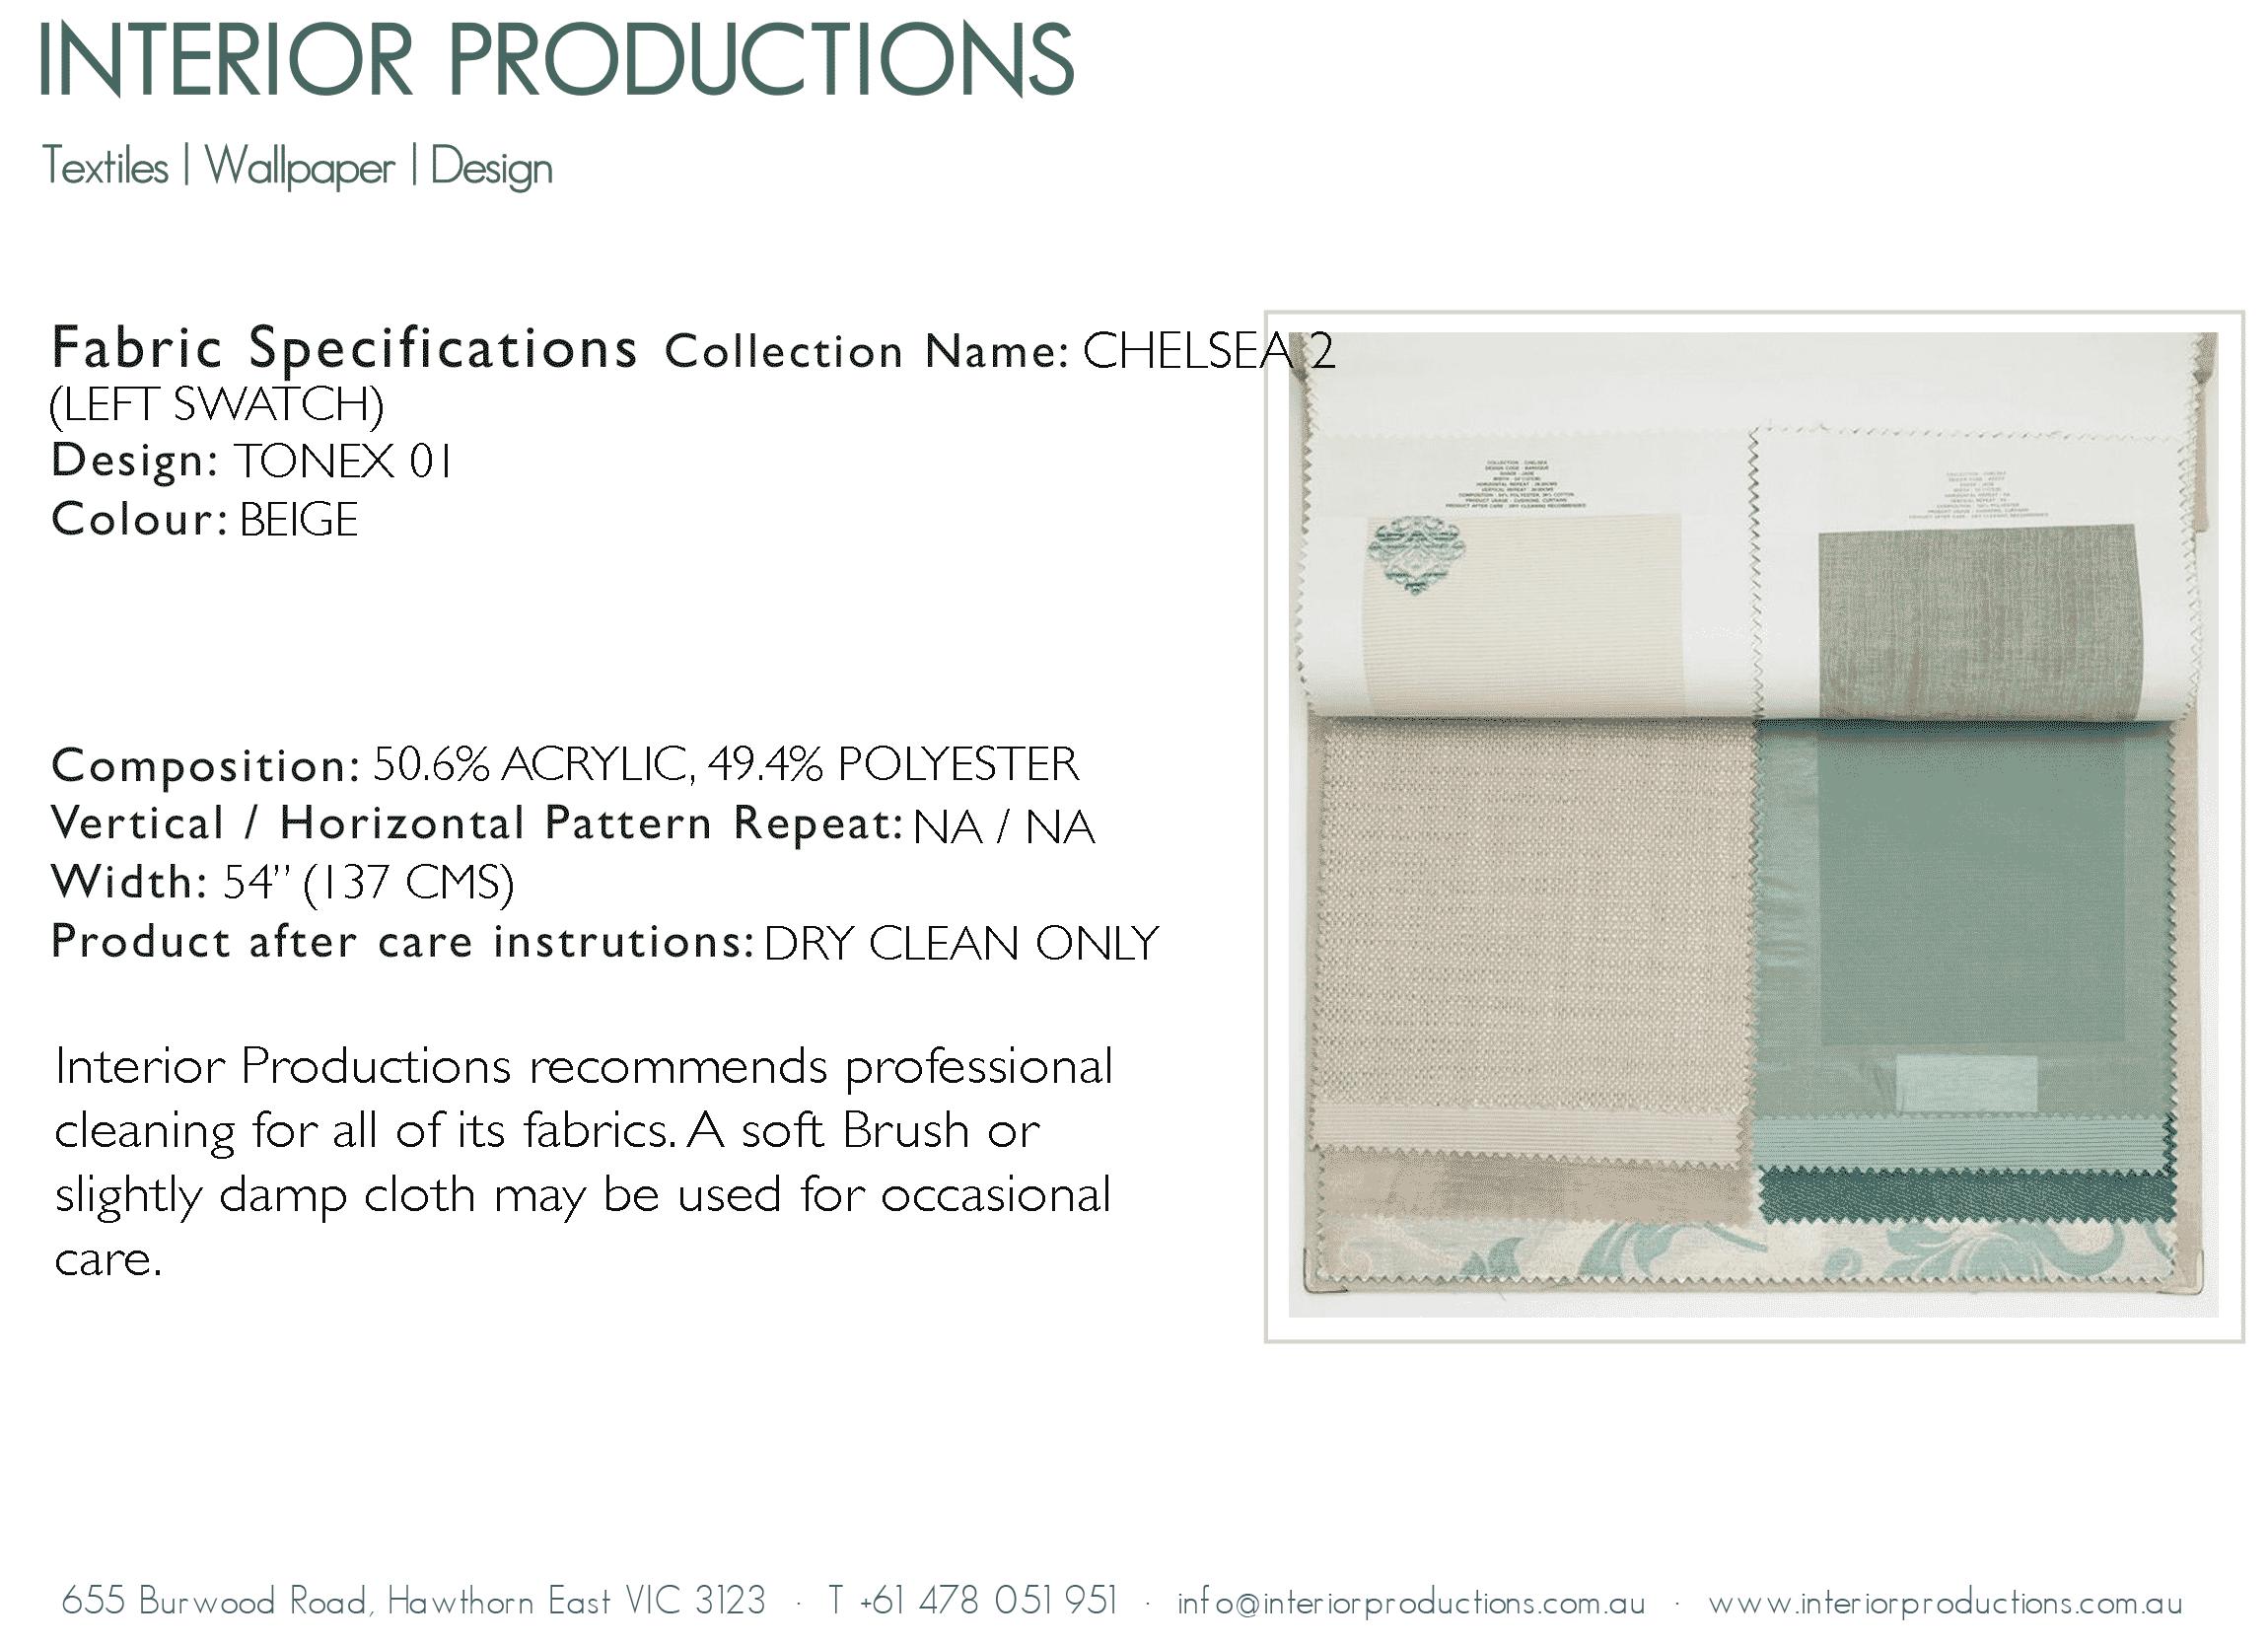 interior_productions_TONEX-01---BEIGE